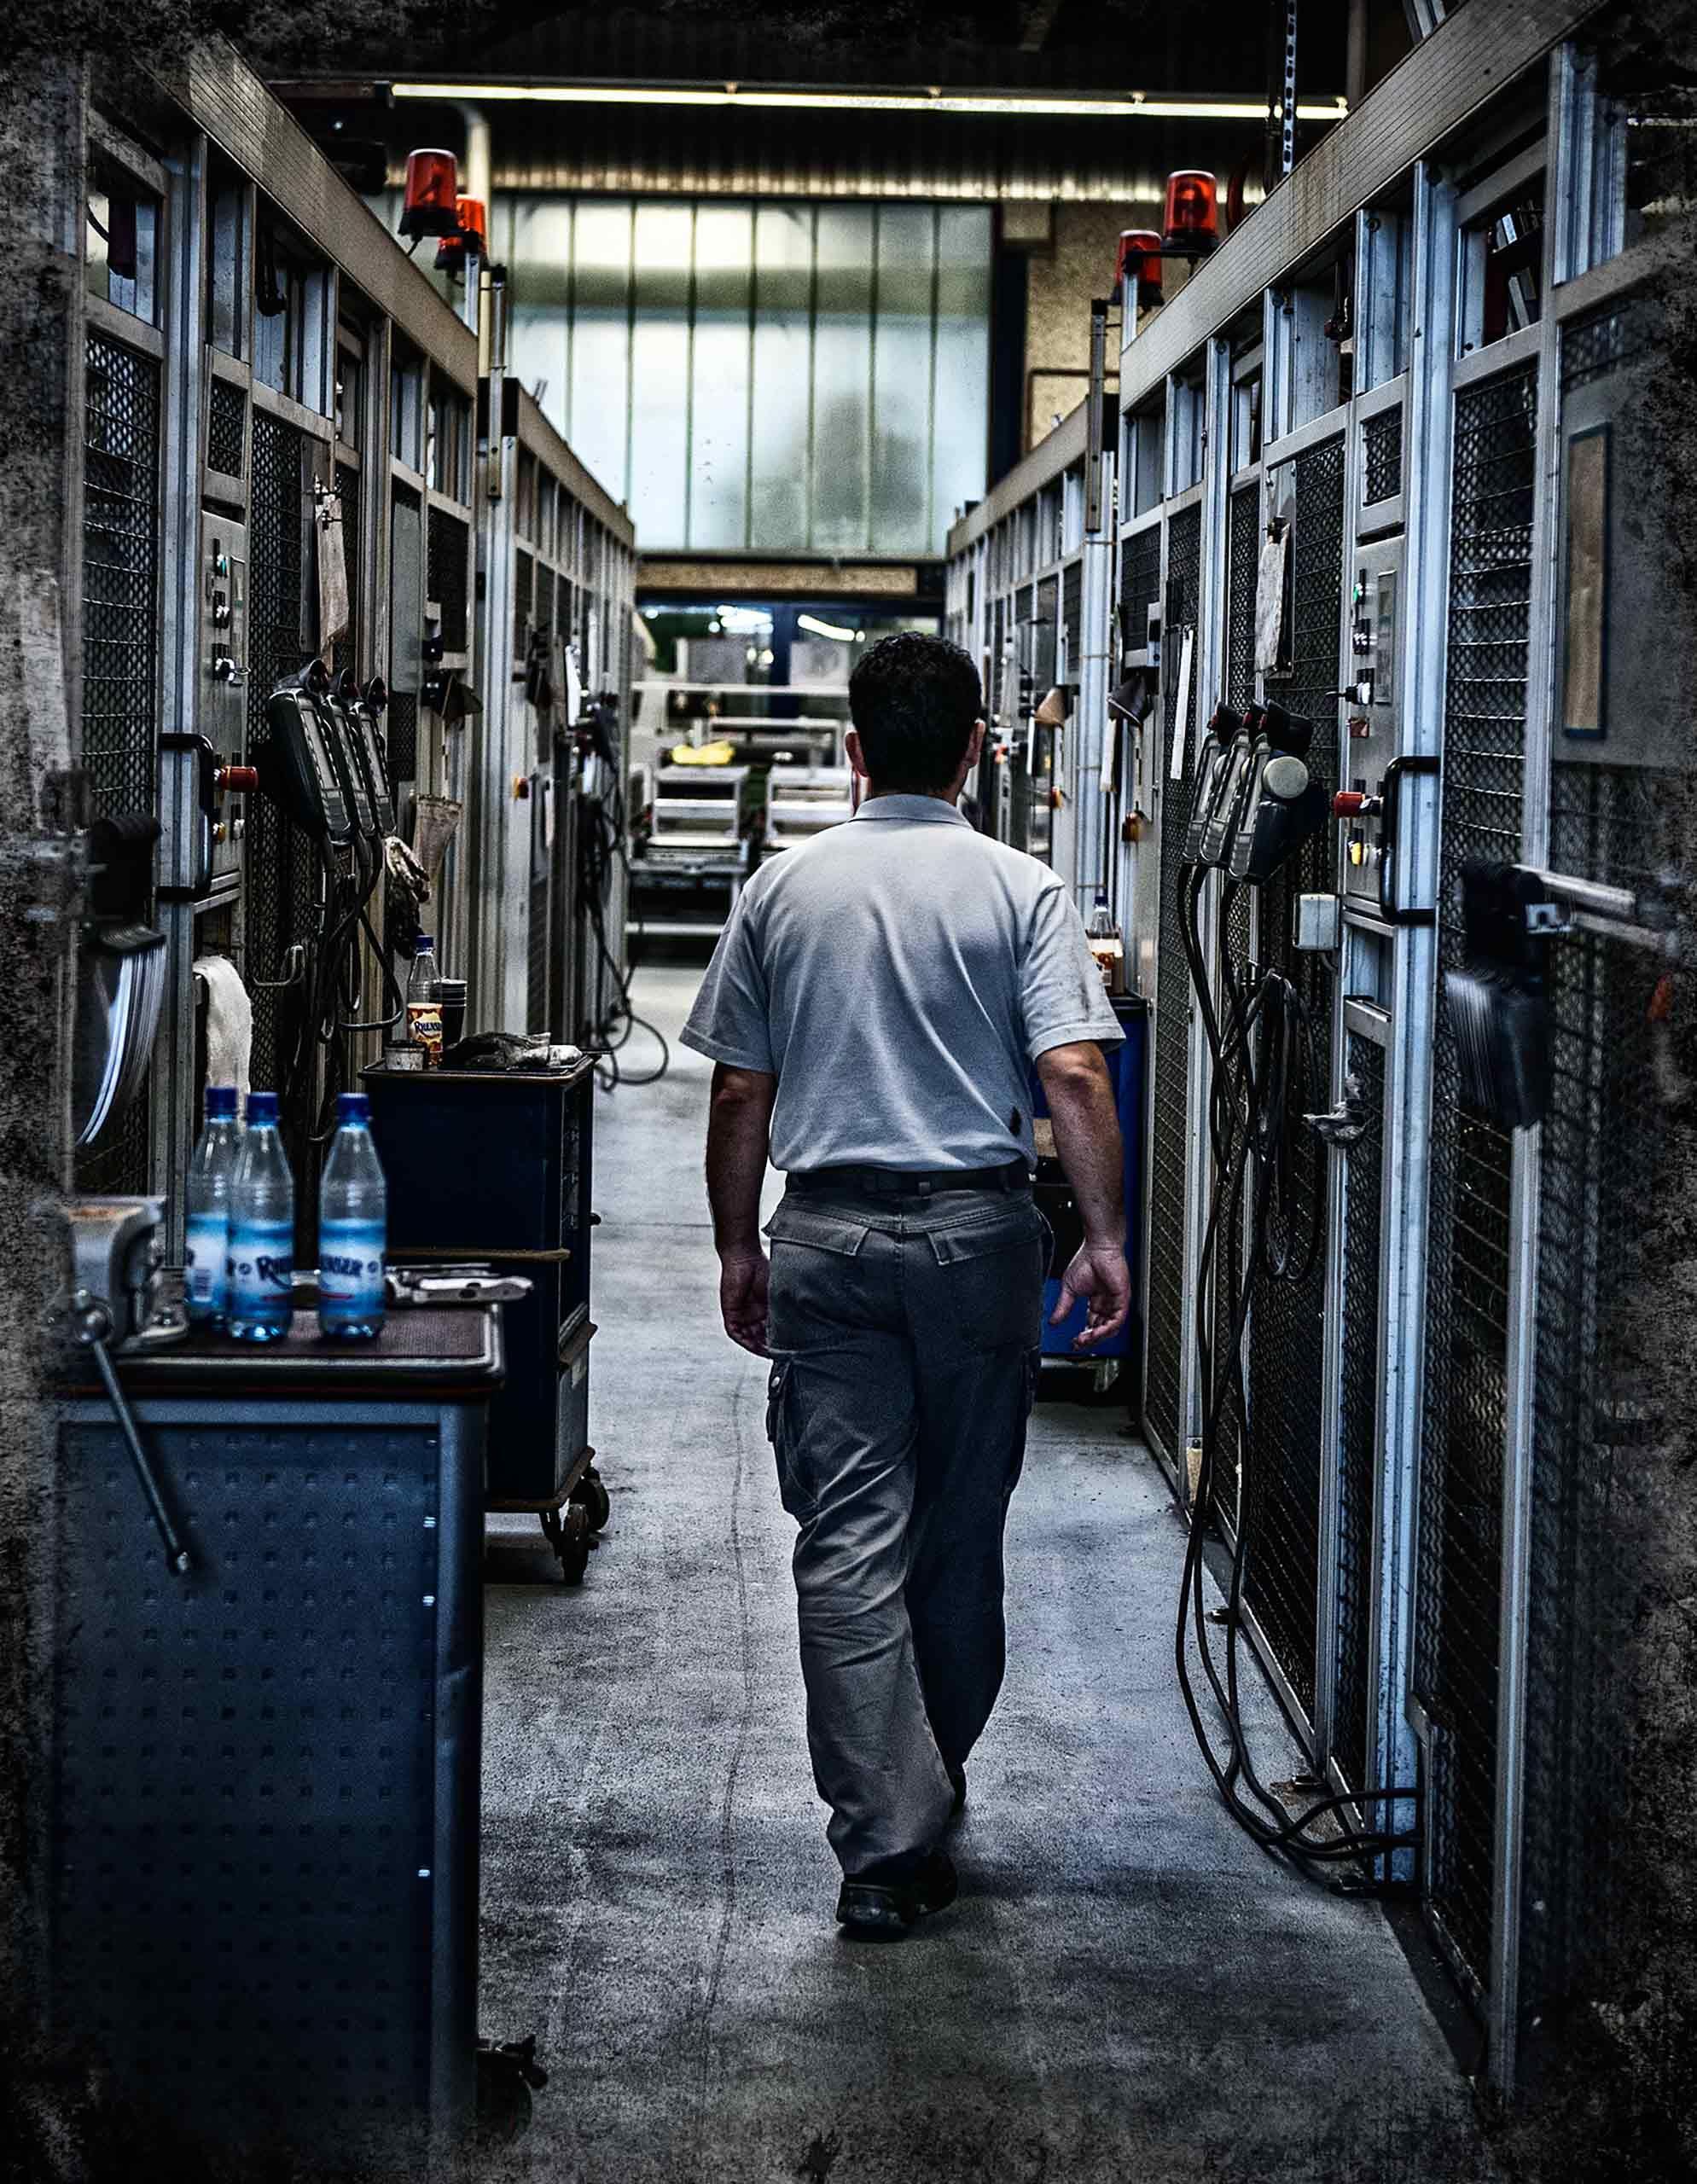 robot-gallery-walk-wustof-factory-solingen-germany-by-HenrikOlundPhotography.jpg